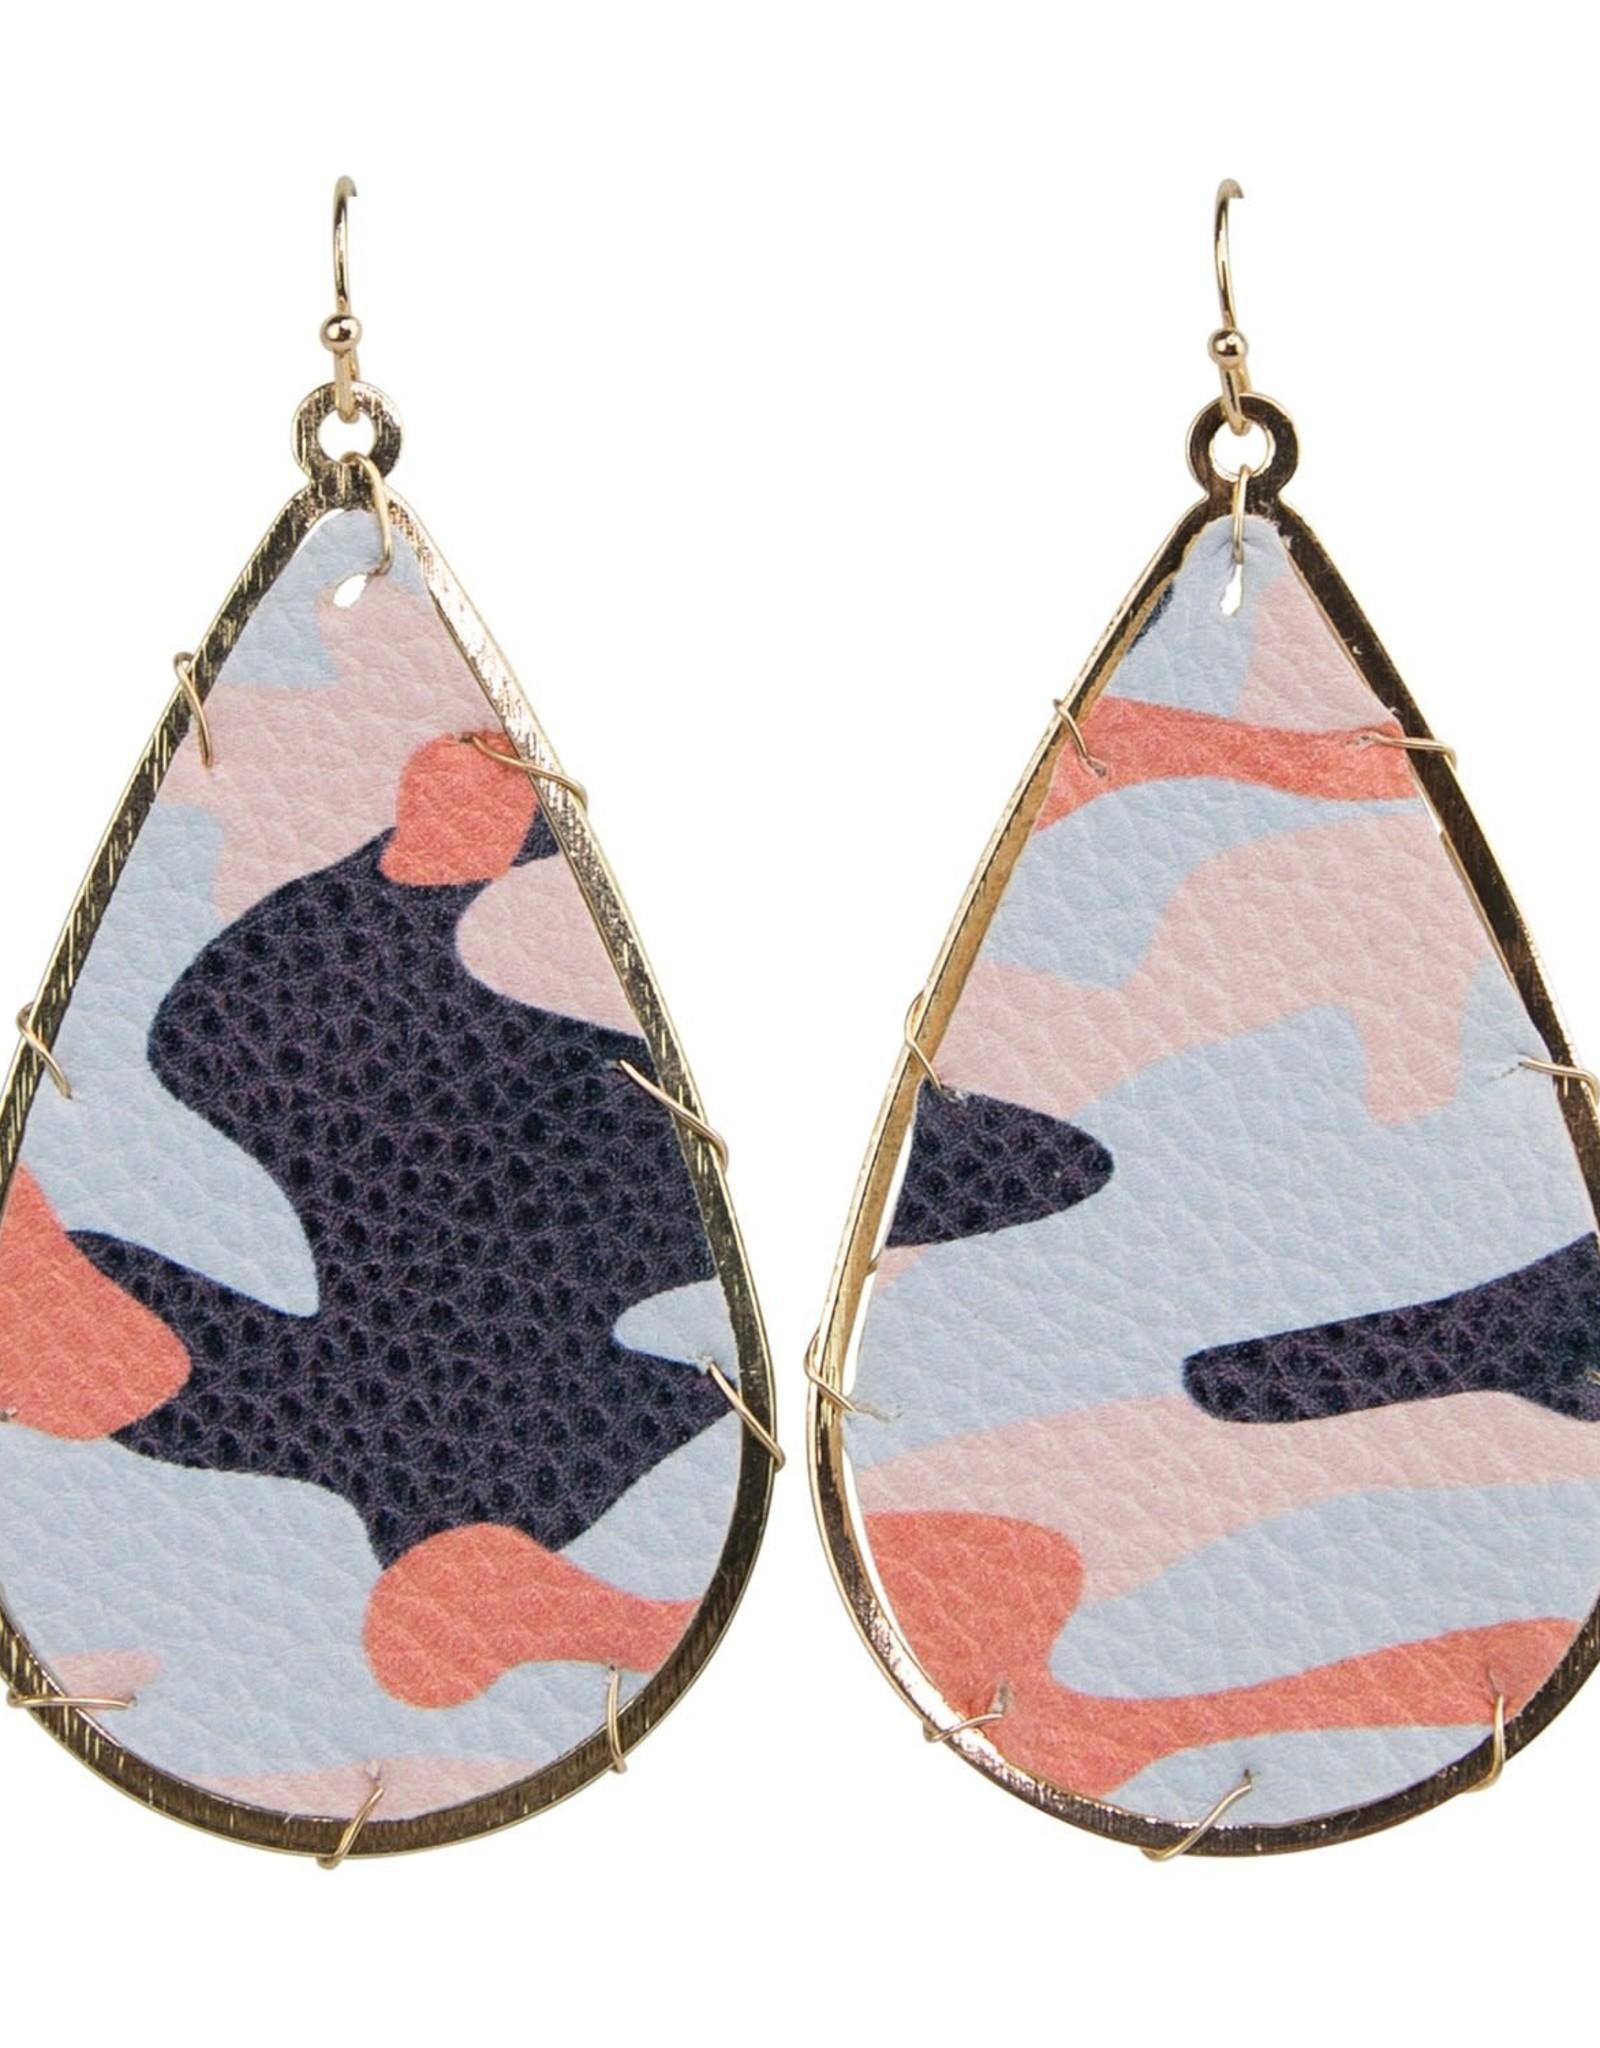 Printed Leather Earrings - Multi Camo